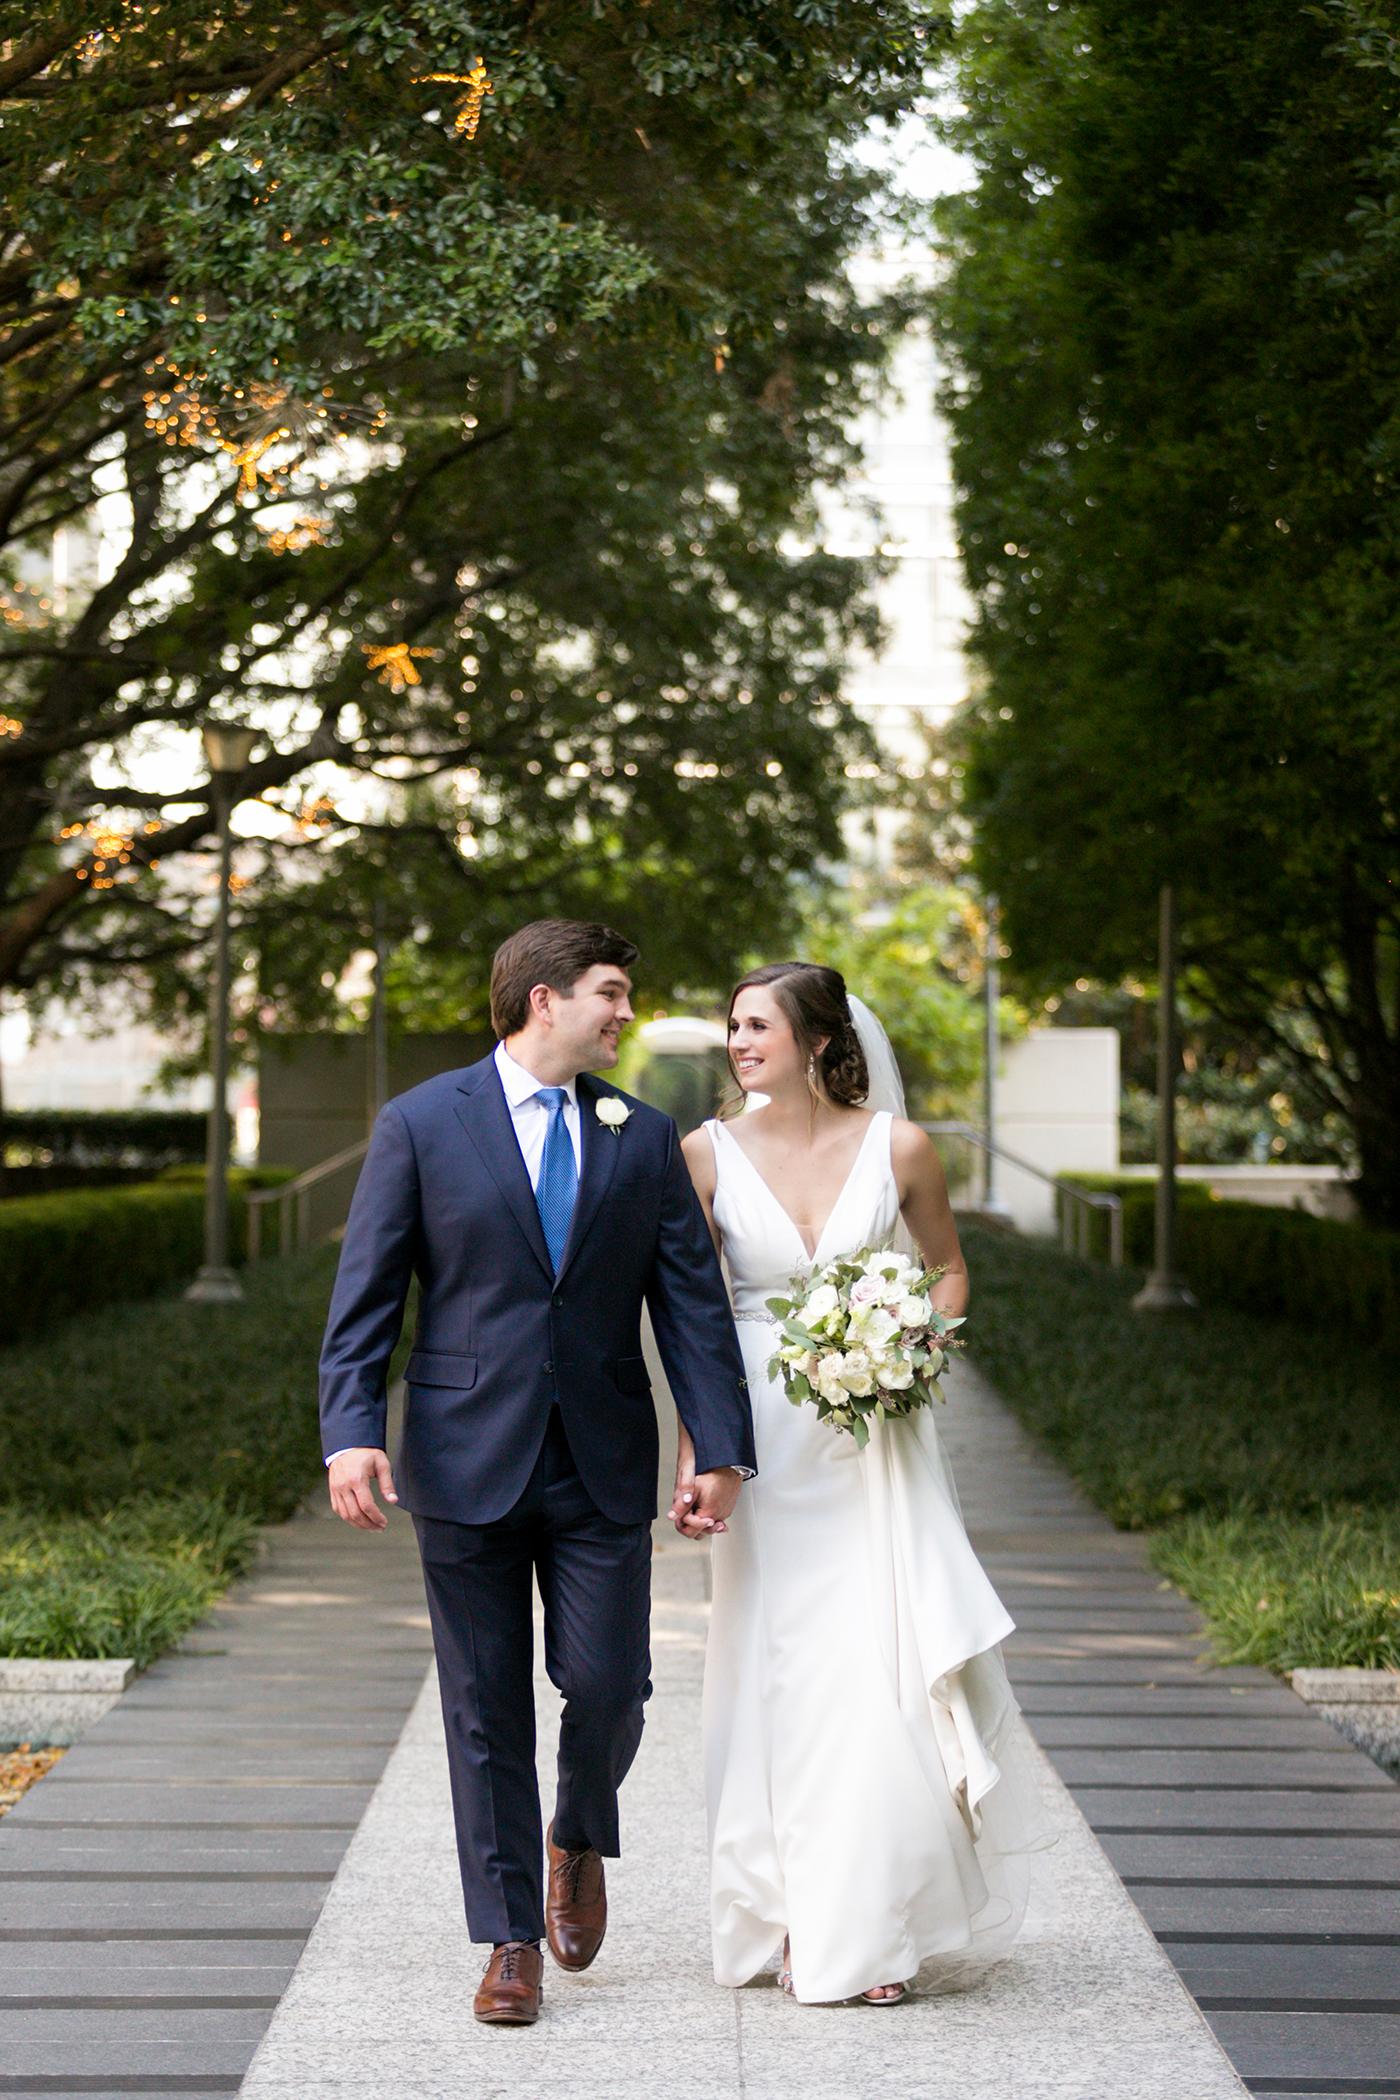 Wedding Planner Dallas TX - Allday Events - Highland Park - Marie Gabrielle Wedding - 283.jpg